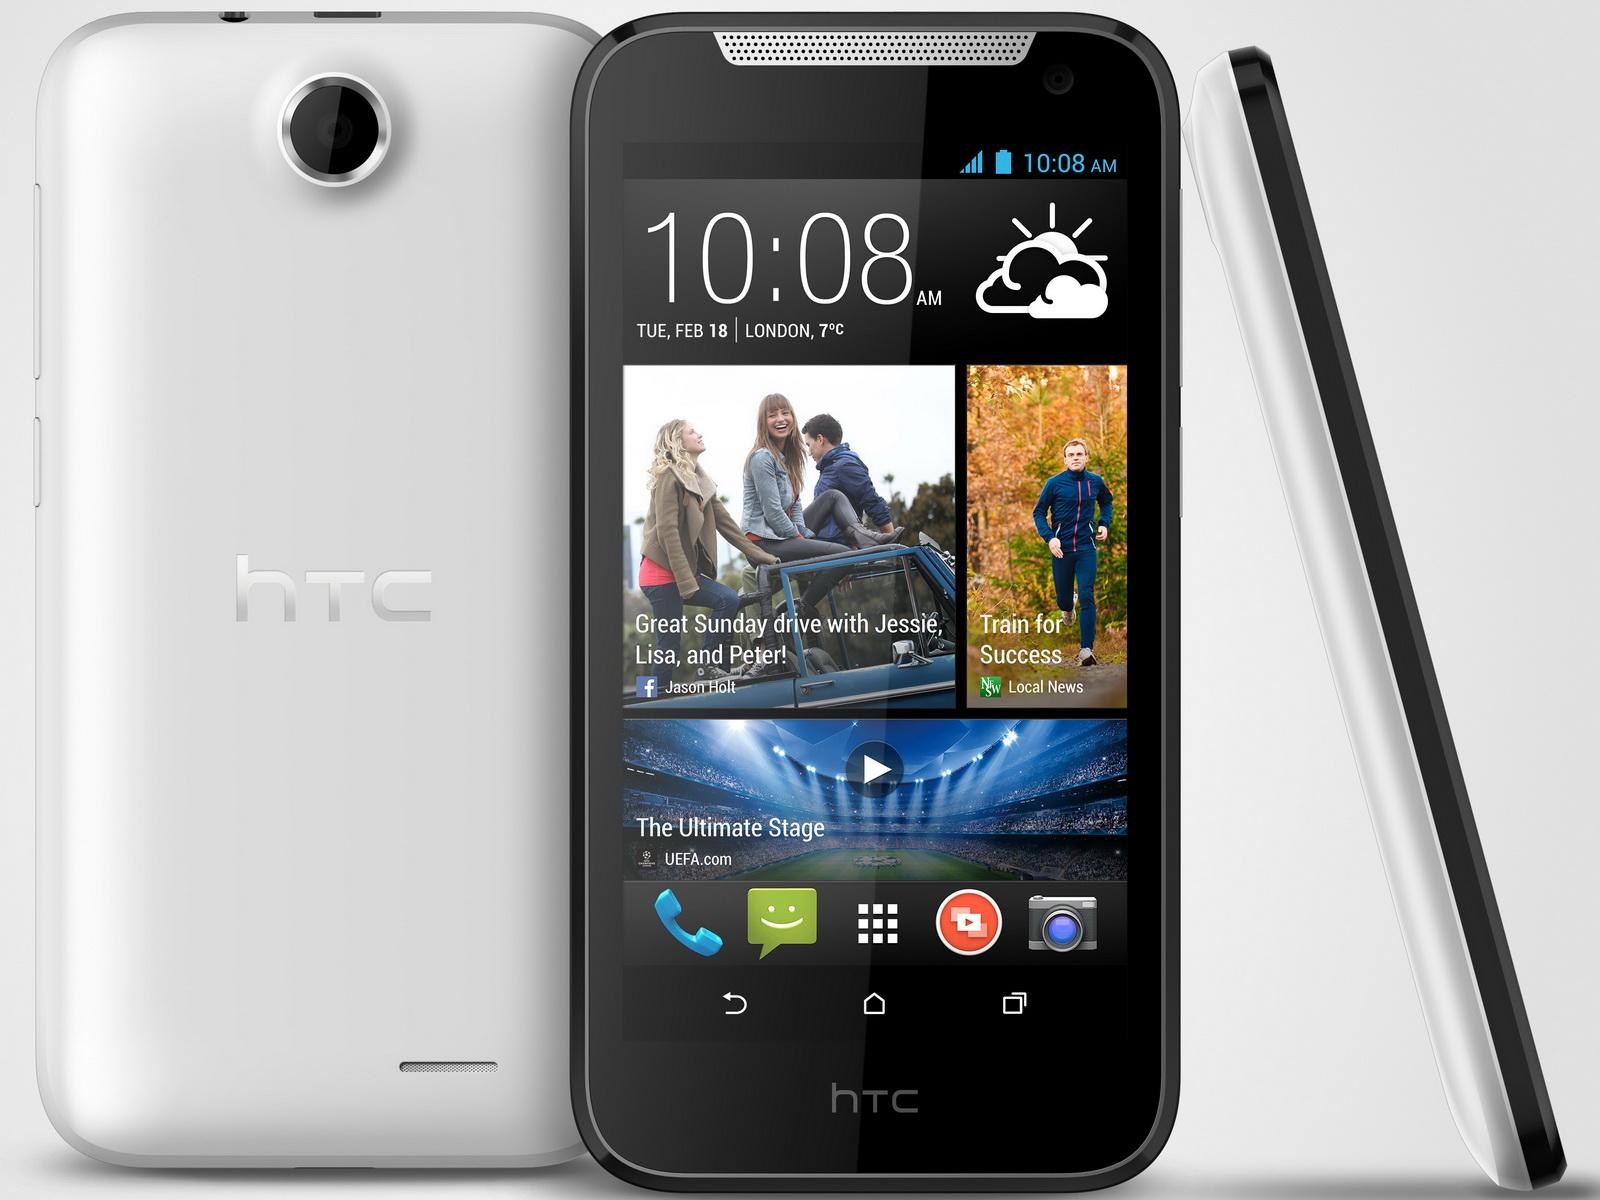 ����� ��� iphone 4 � ��������